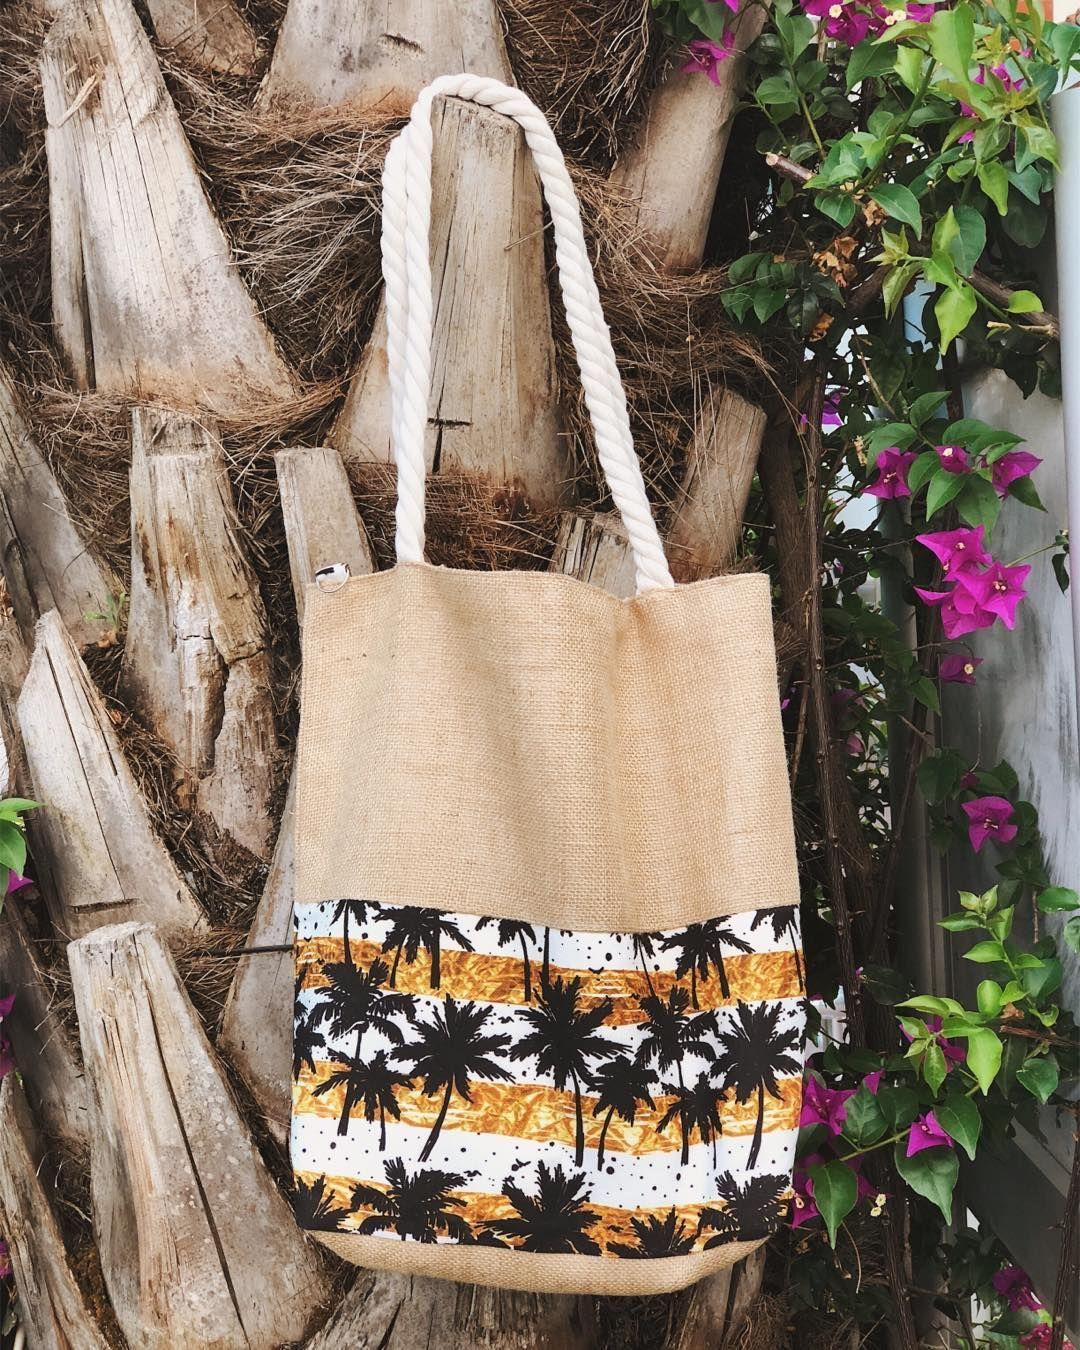 Rahat, hafif ve stil sahibi🧡 Palmiye desenli plaj çantası için ➡️ www.chillax.co #chillax #chillaxstil #elyapimicanta #plajcantasi #hasircanta #yazstili #musthave